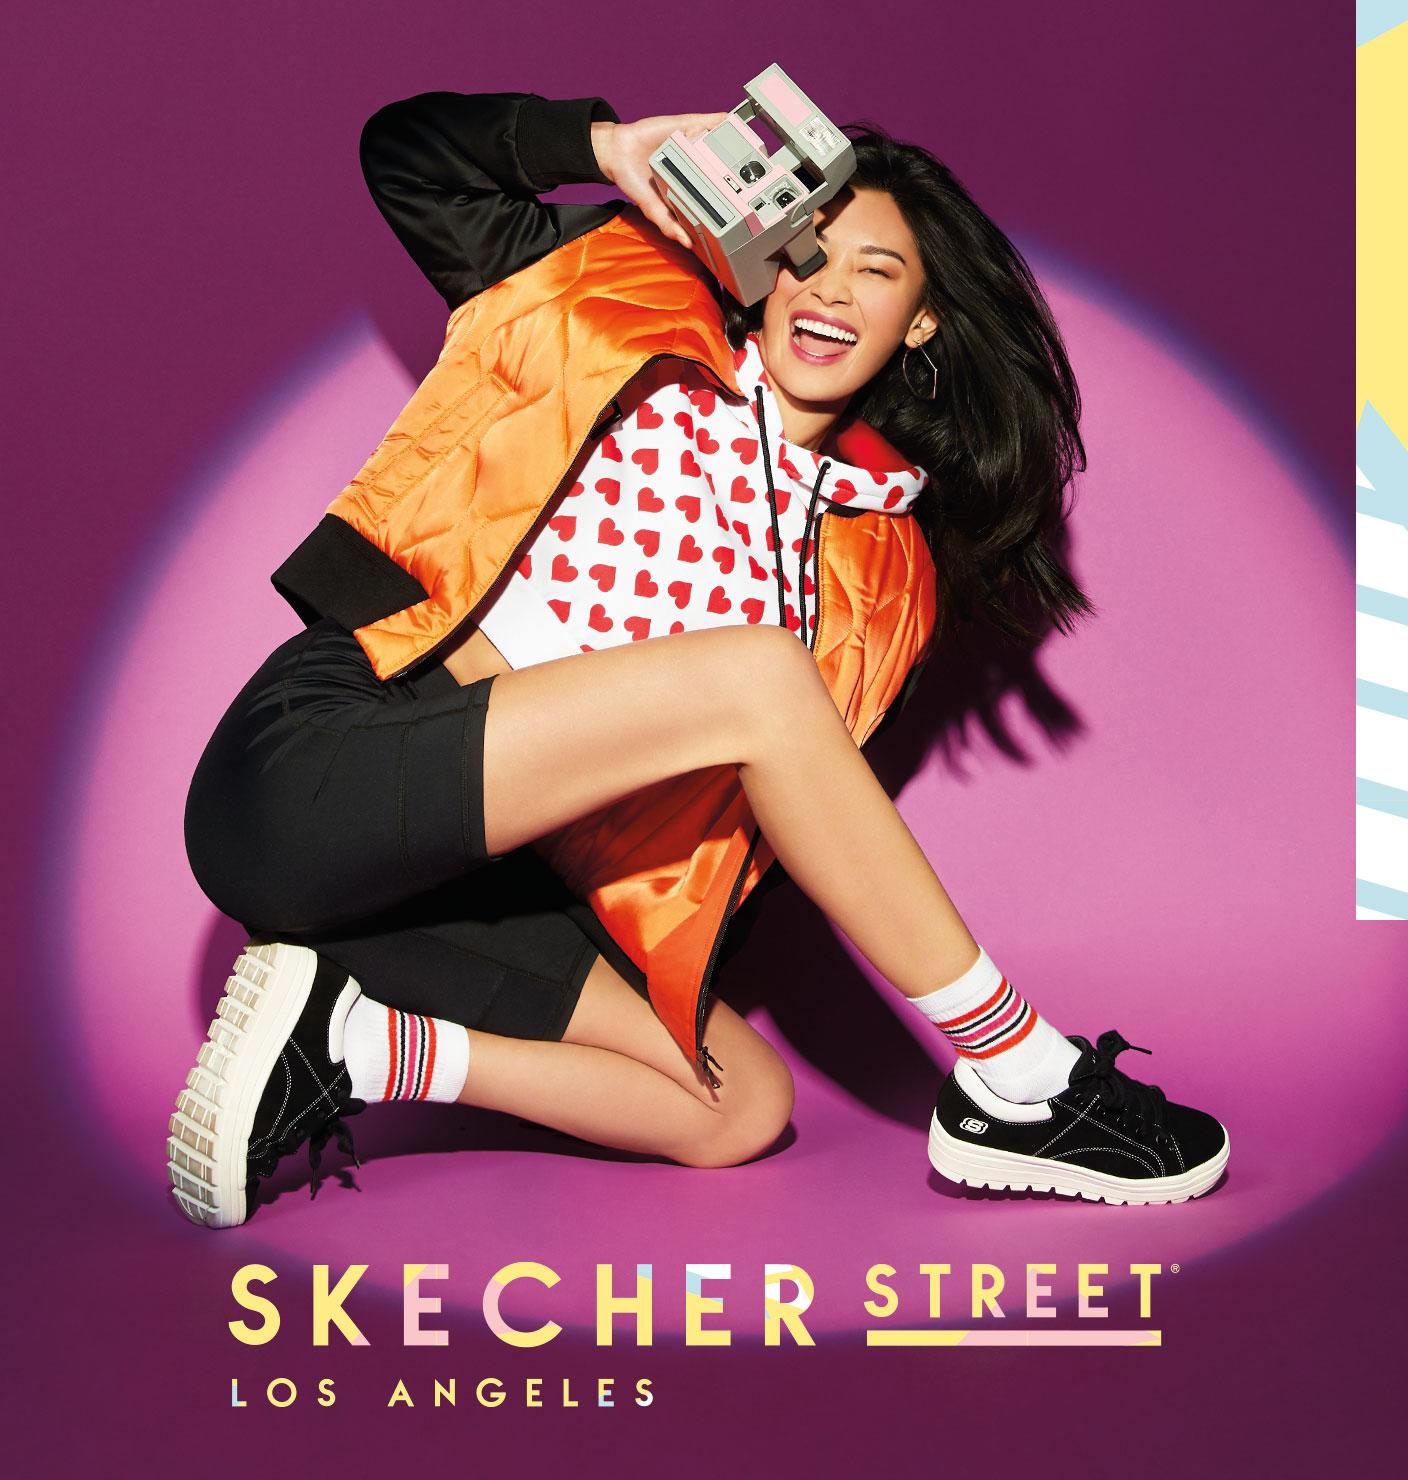 sketcher outlet store